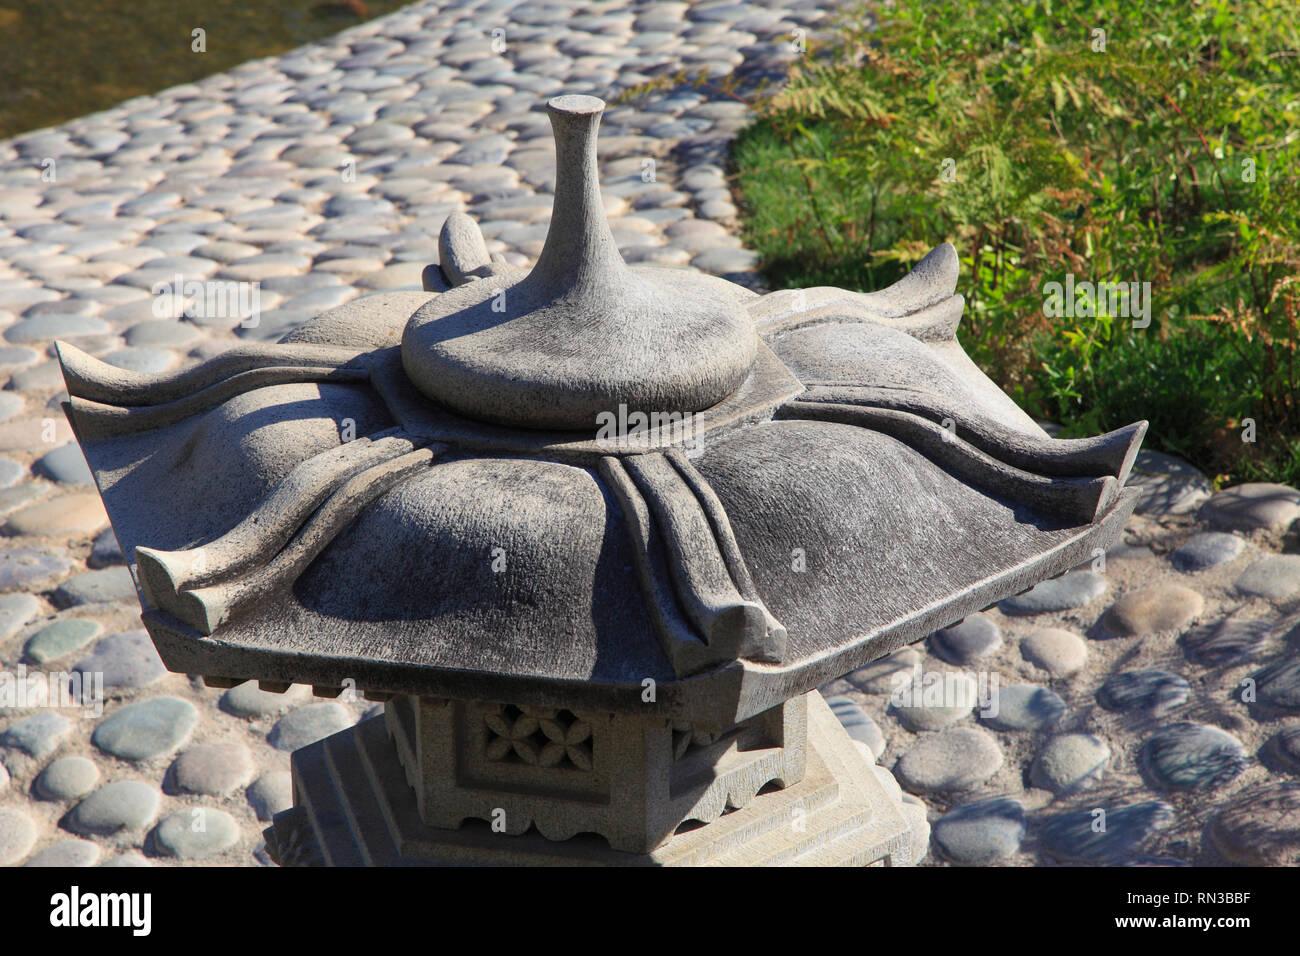 Japanese Garden With Lantern Stock Photos & Japanese Garden With